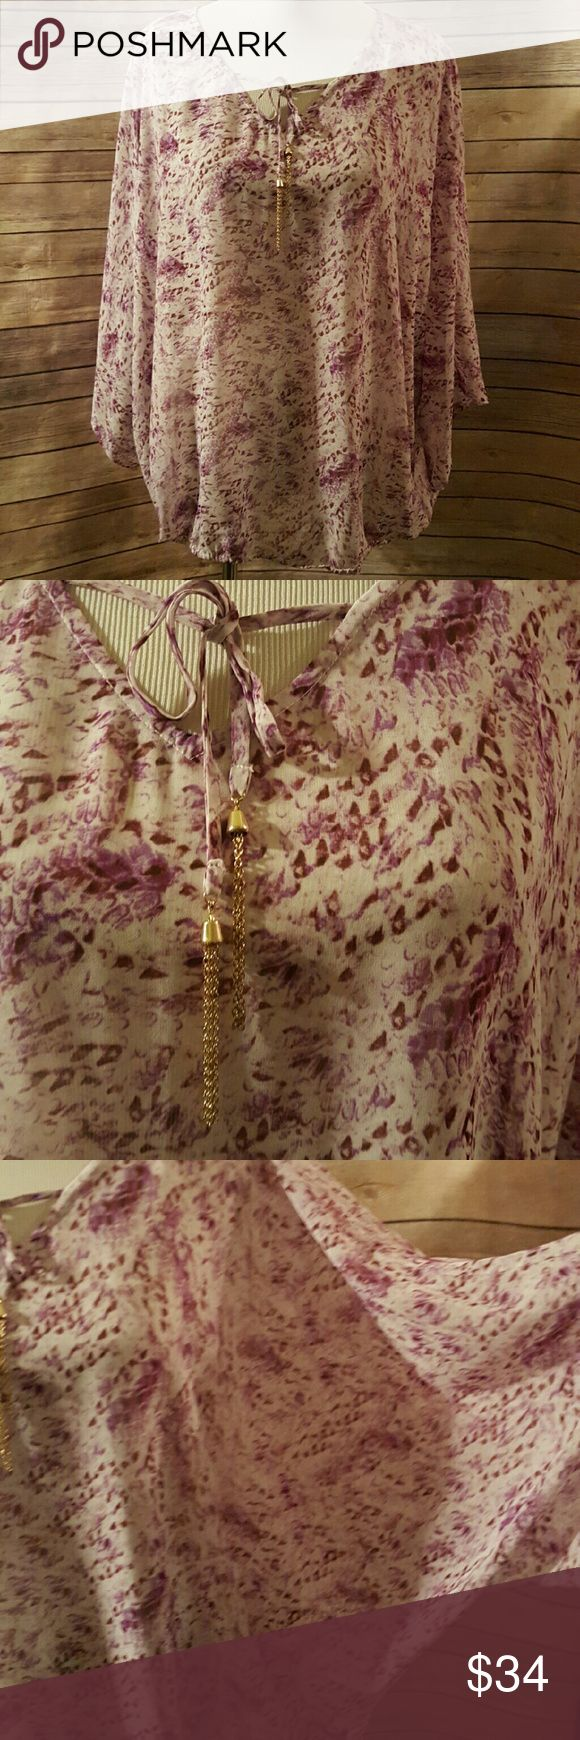 Purple plus size blouse Jessica Simpson size 3x.  Elastic bottom. Dolman/batwing sleeves.  Beautiful purple floral.  Has gold tie accent on neckline. Jessica Simpson Tops